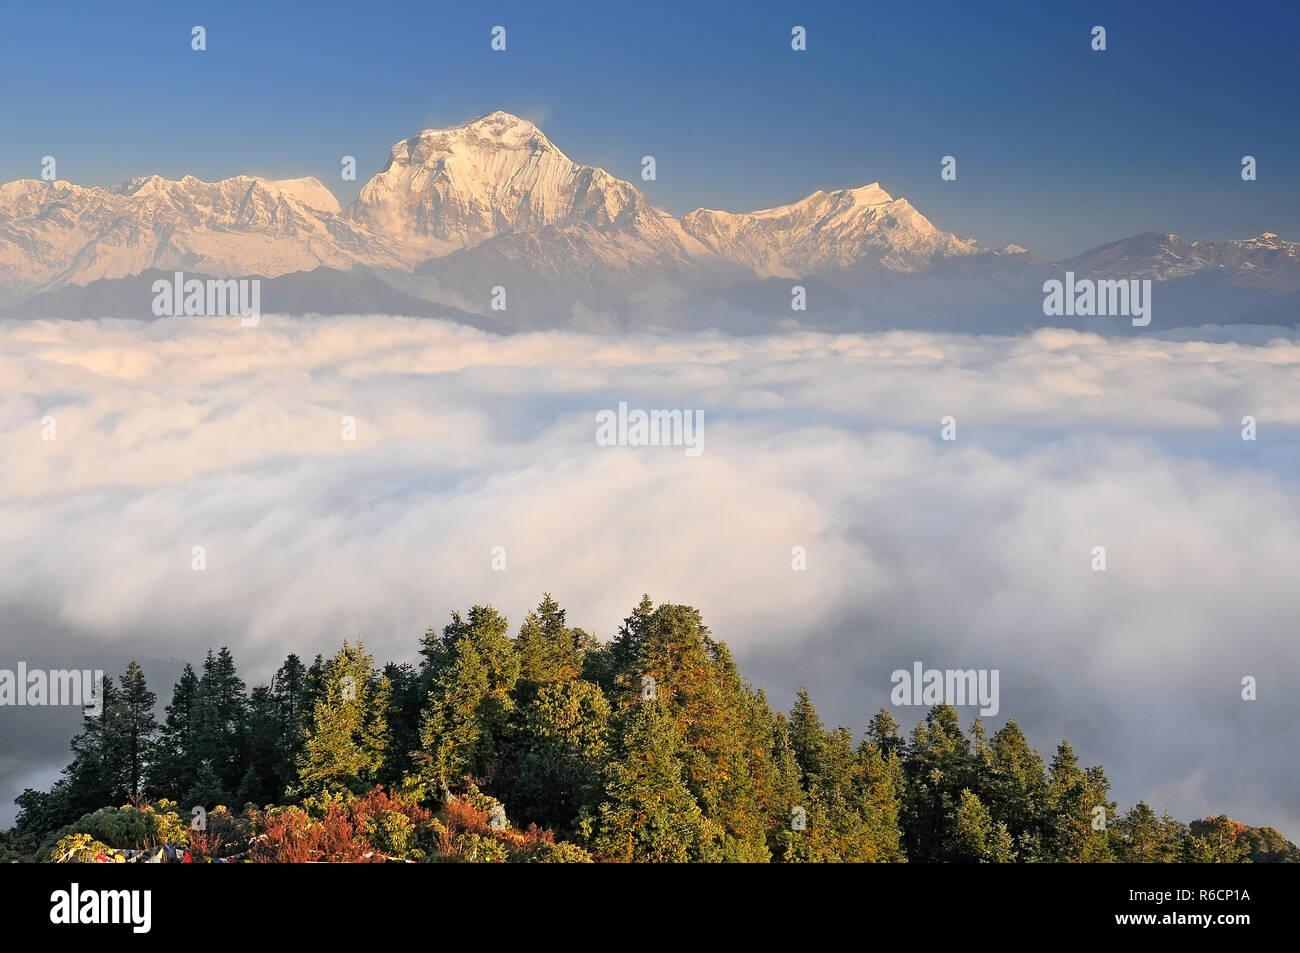 Nepal, Ghorepani, Poon Hill, Dhaulagiri Massif, Himalaya, Dhaulagiri Range Looking West From Poon Hill Stock Photo